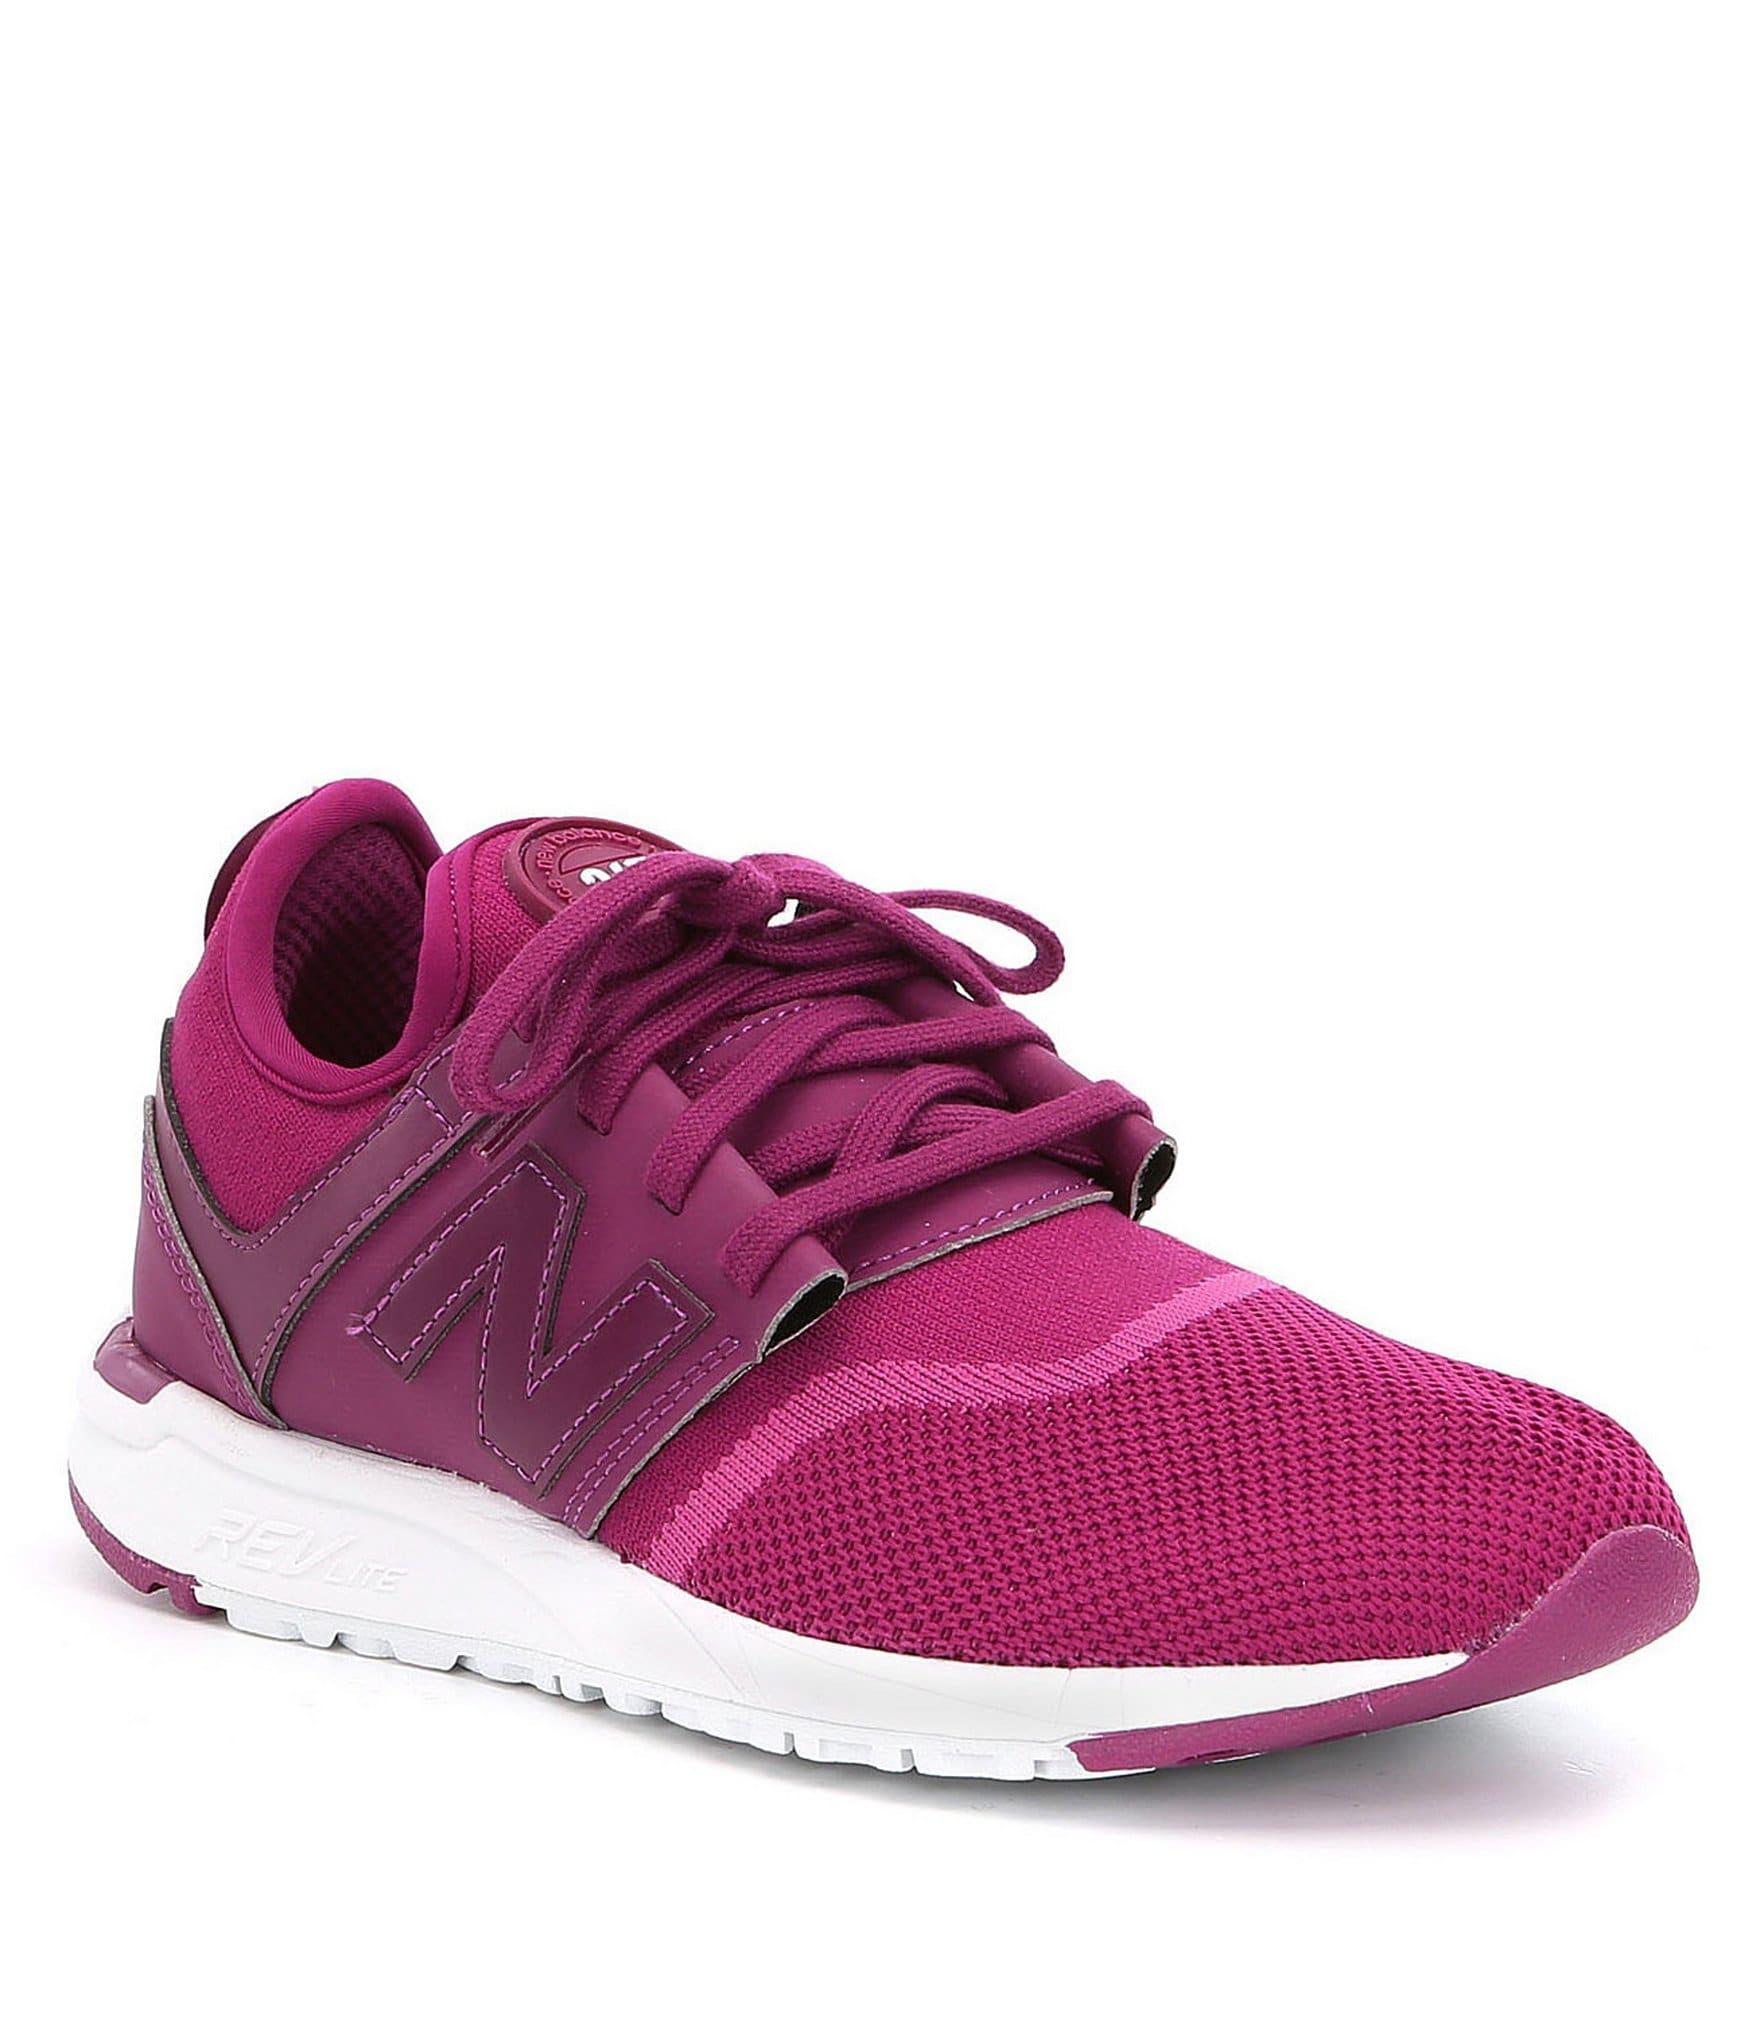 new balance womens 247 running shoes dillards